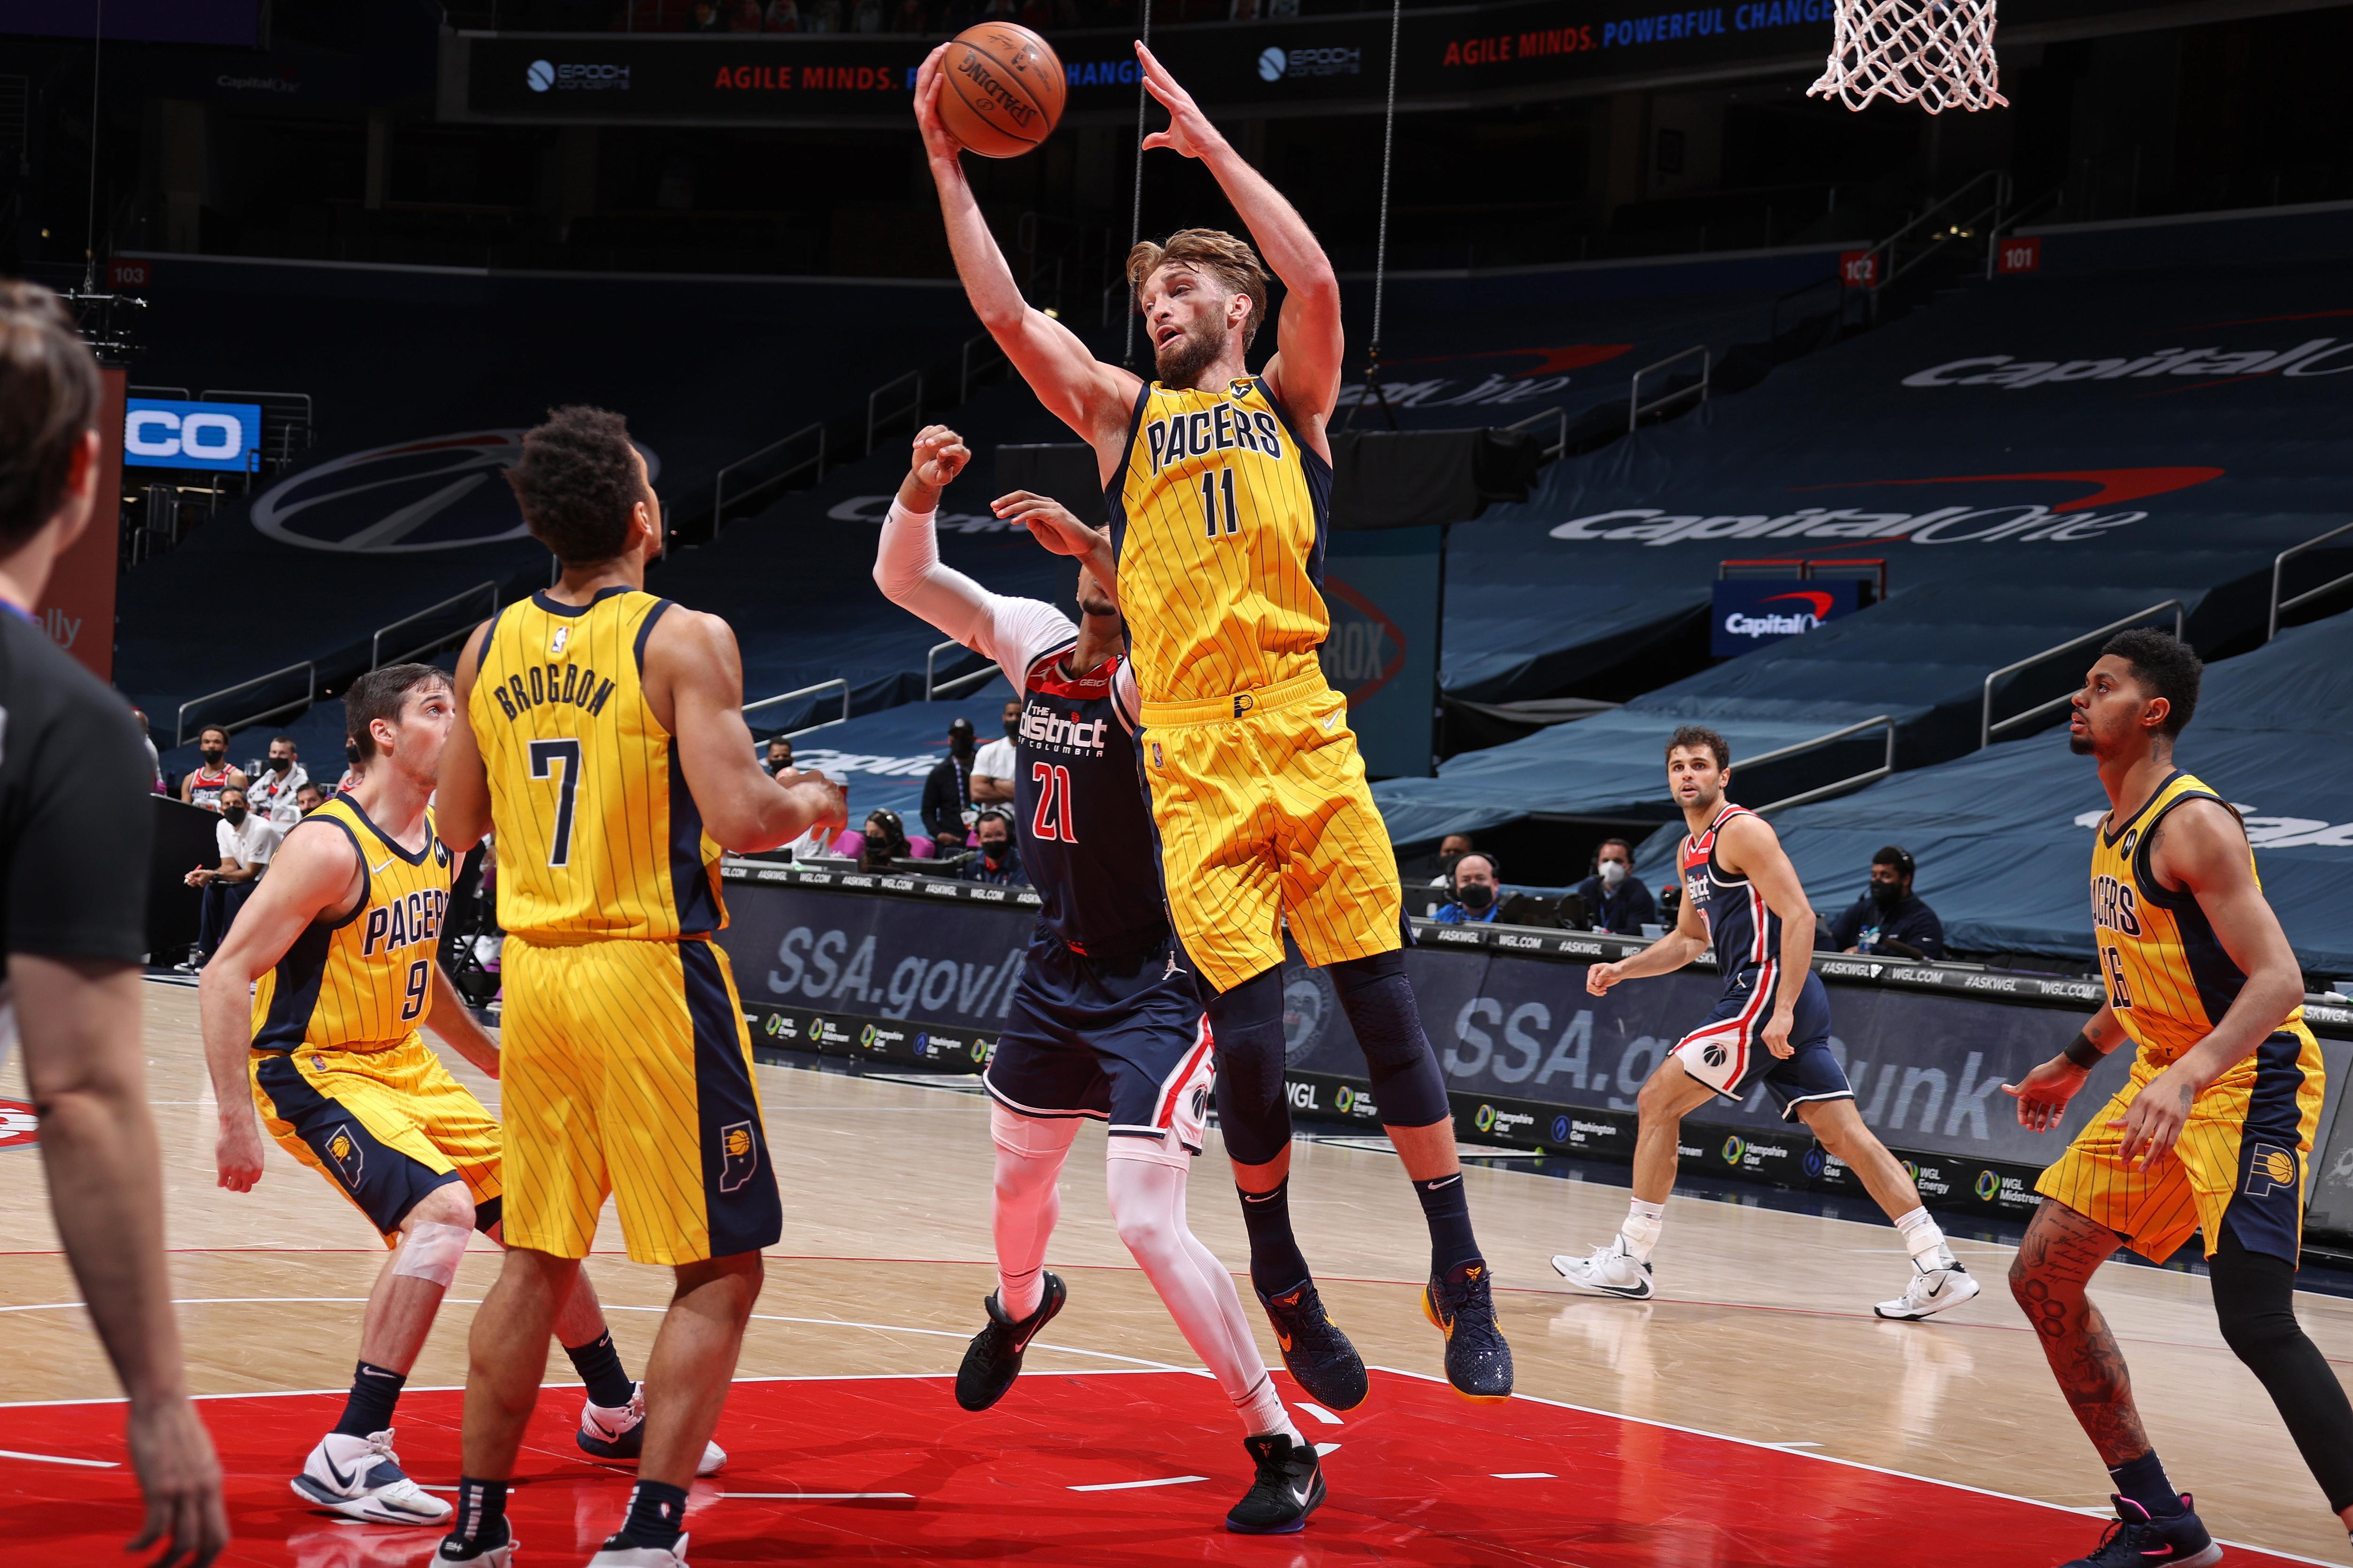 Indiana Pacers vs. Washington Wizards